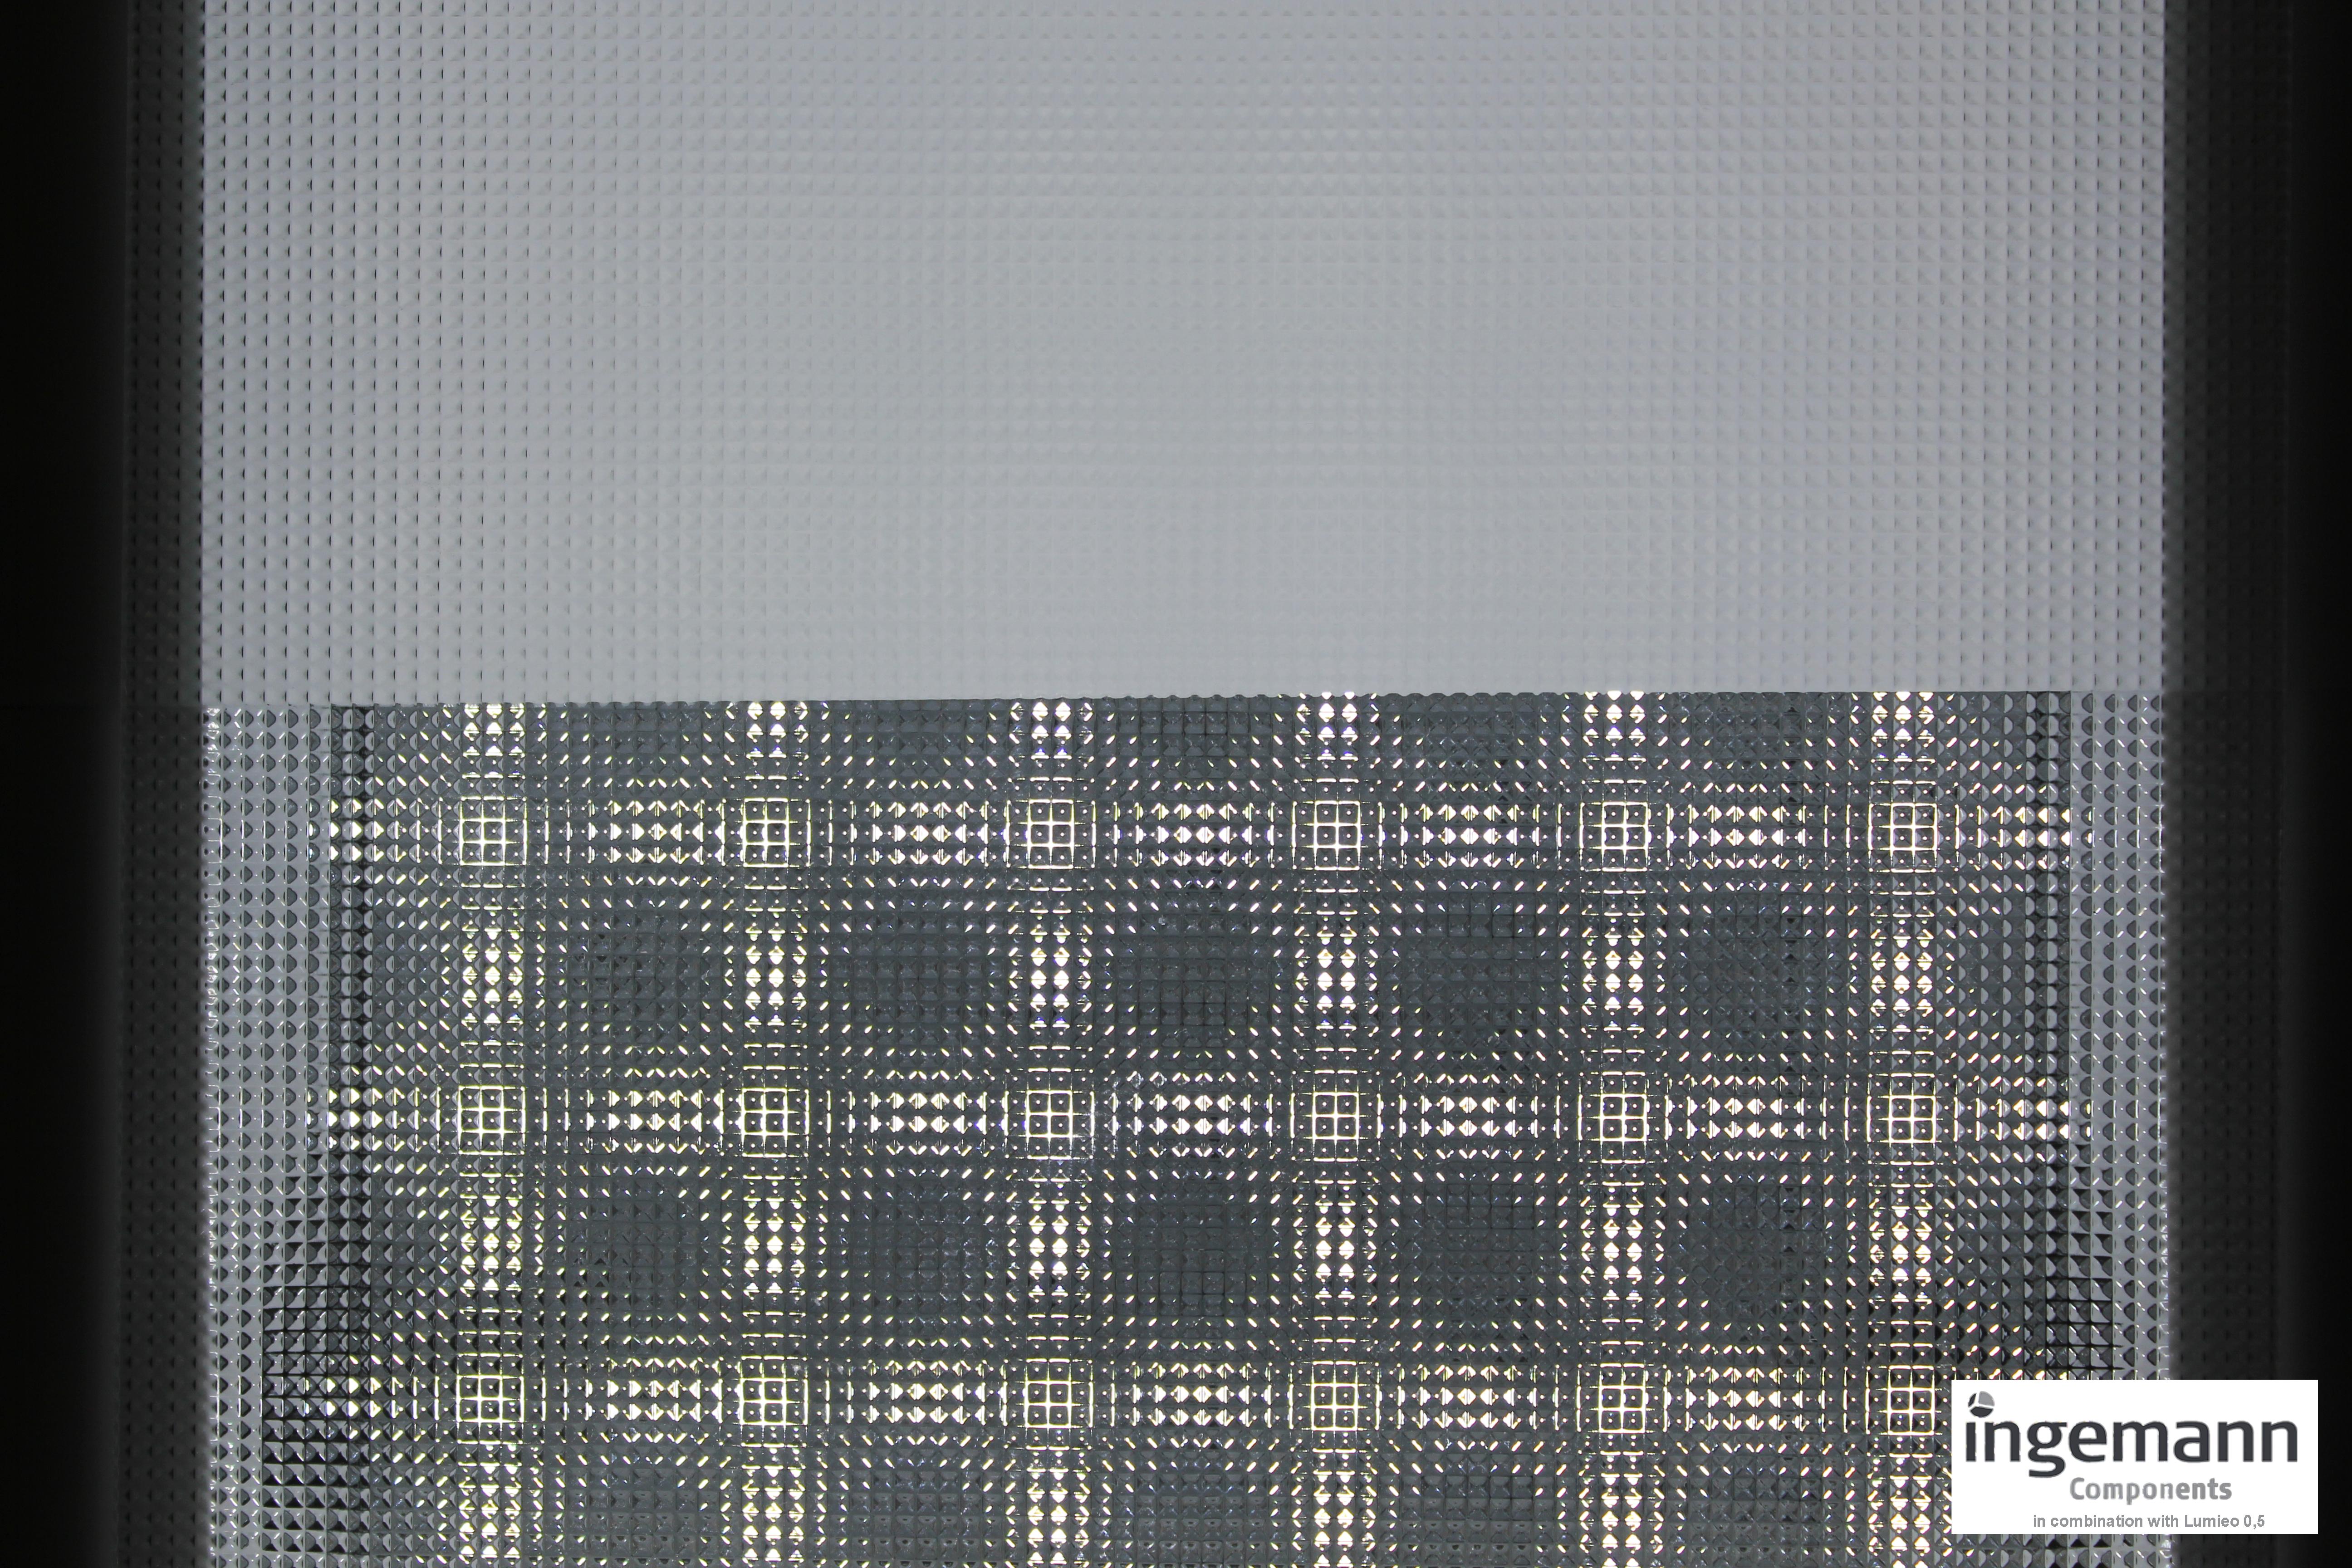 MicroMid - Ingemann Components